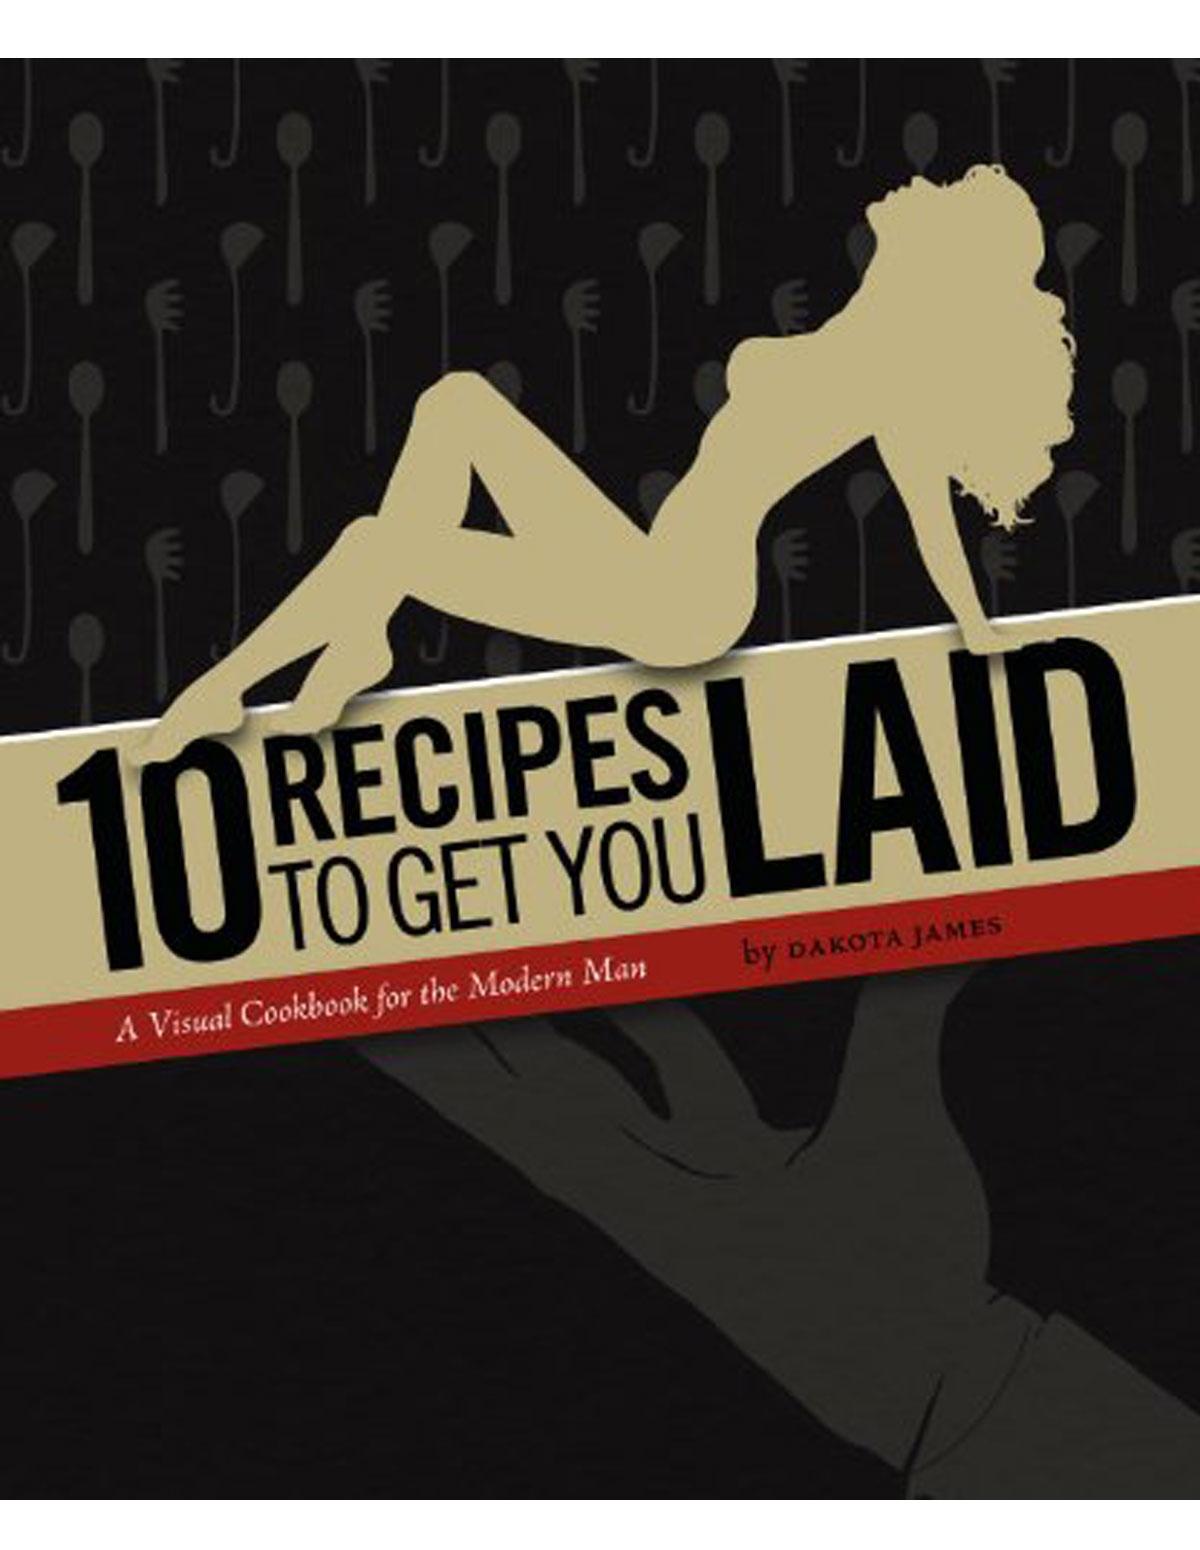 10 Recipes To Get You Laid